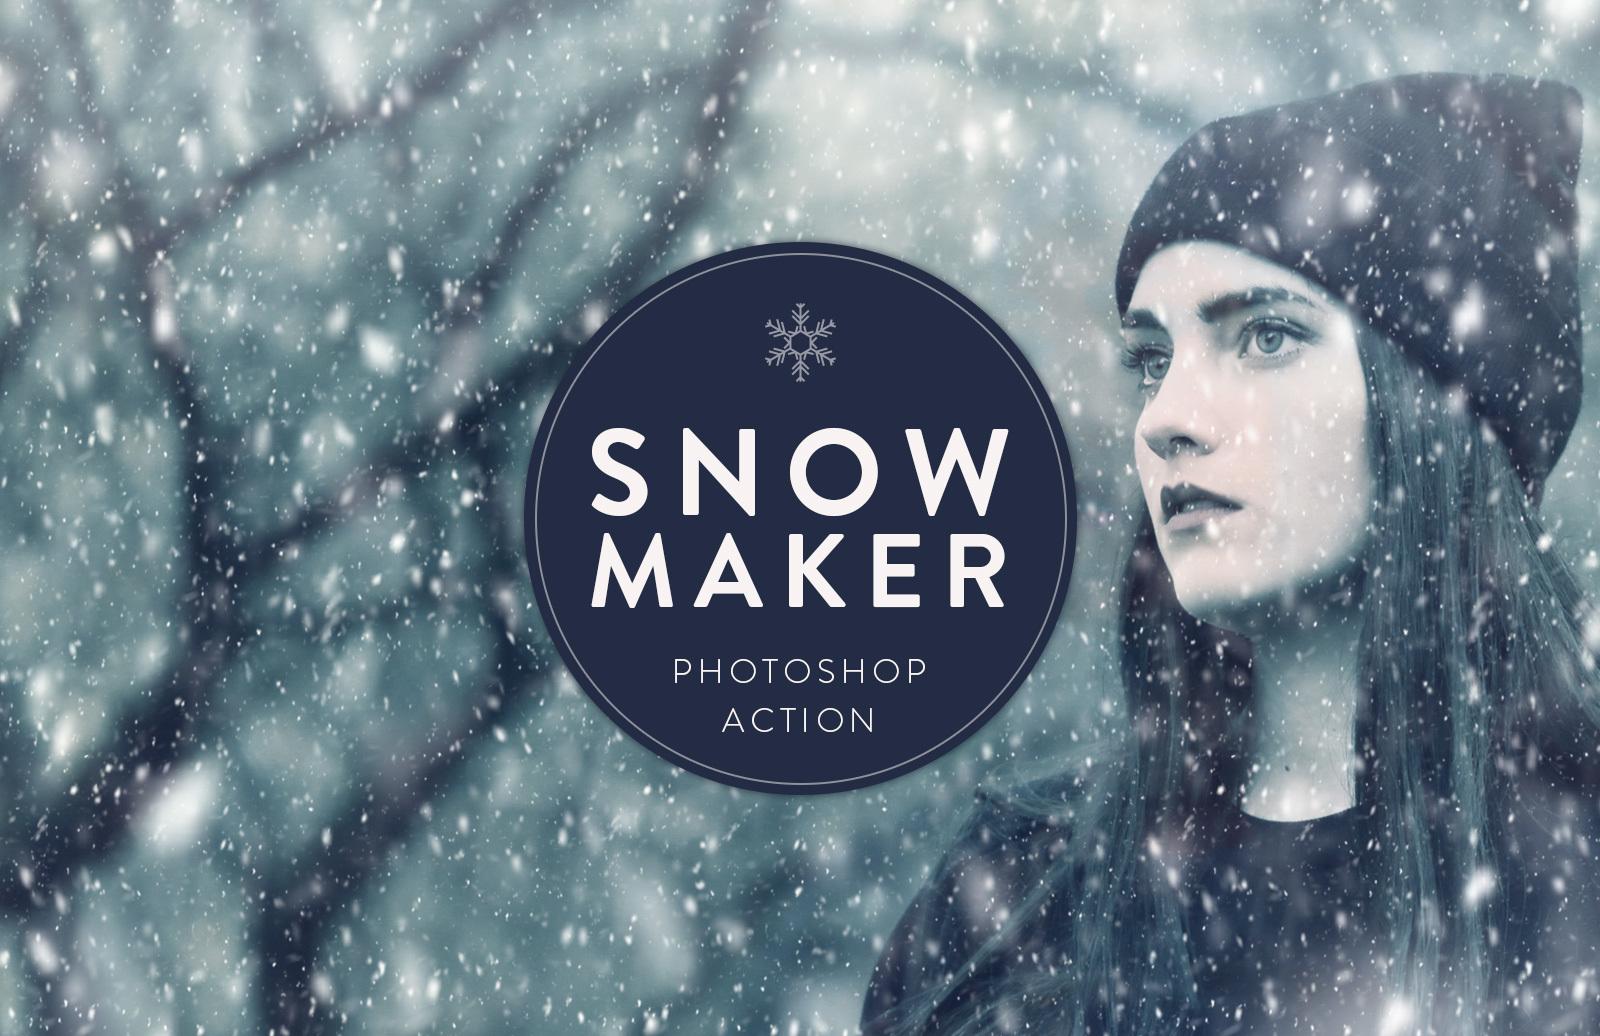 Snow Maker Photoshop Action 1